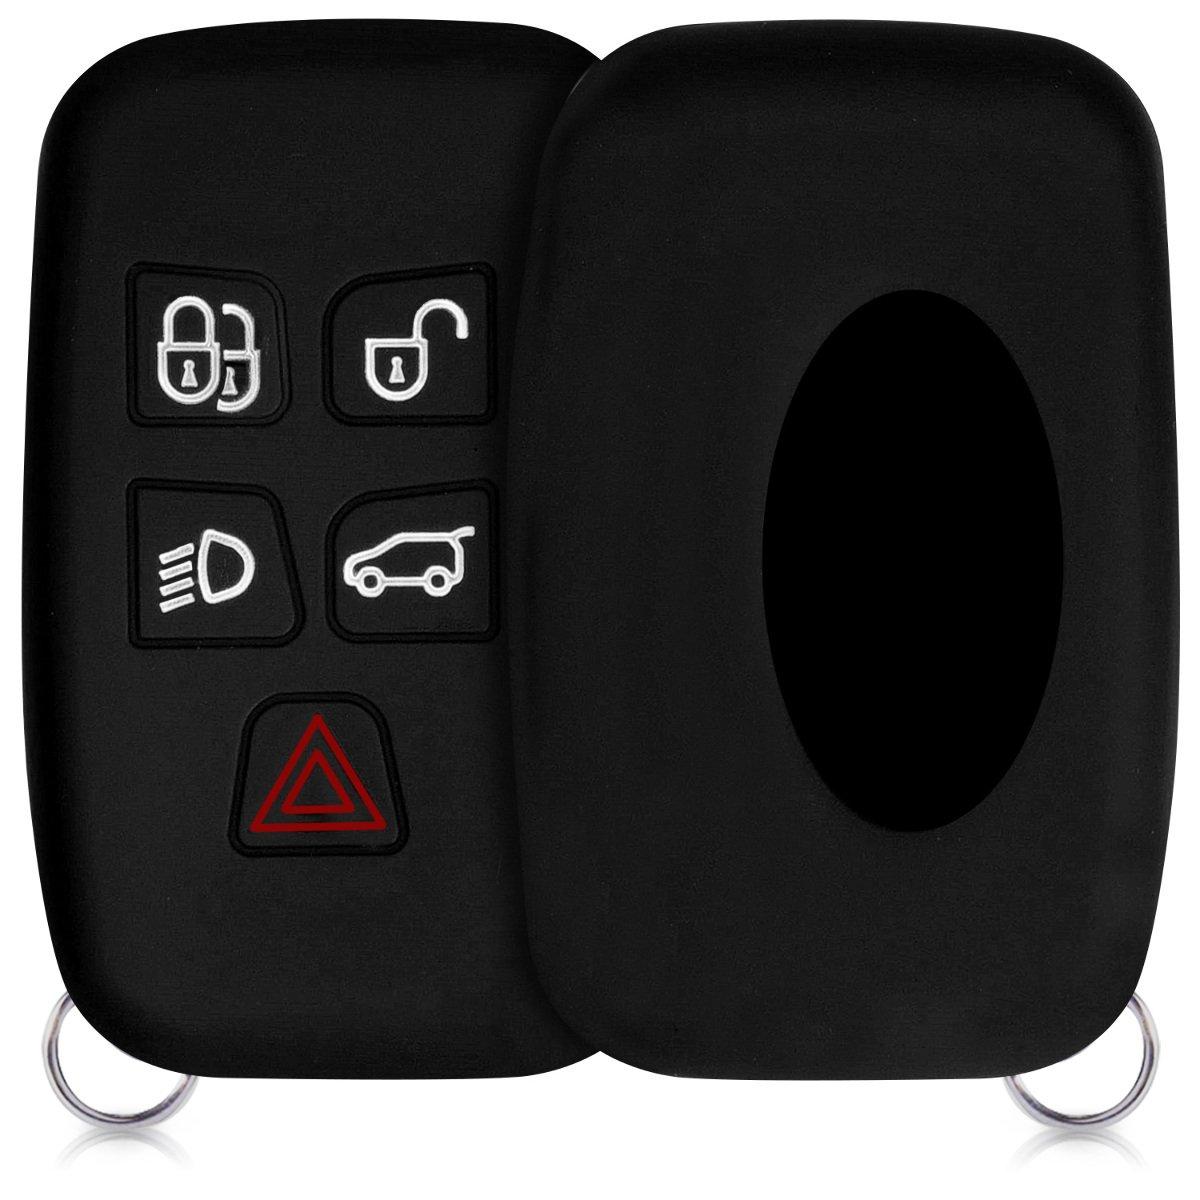 kwmobile Funda para Llave con Control Remoto de 5 Botones para Coche Land Rover Jaguar Carcasa Protectora de Suave - Case de Mando de Auto con dise/ño de Carbono Silicona